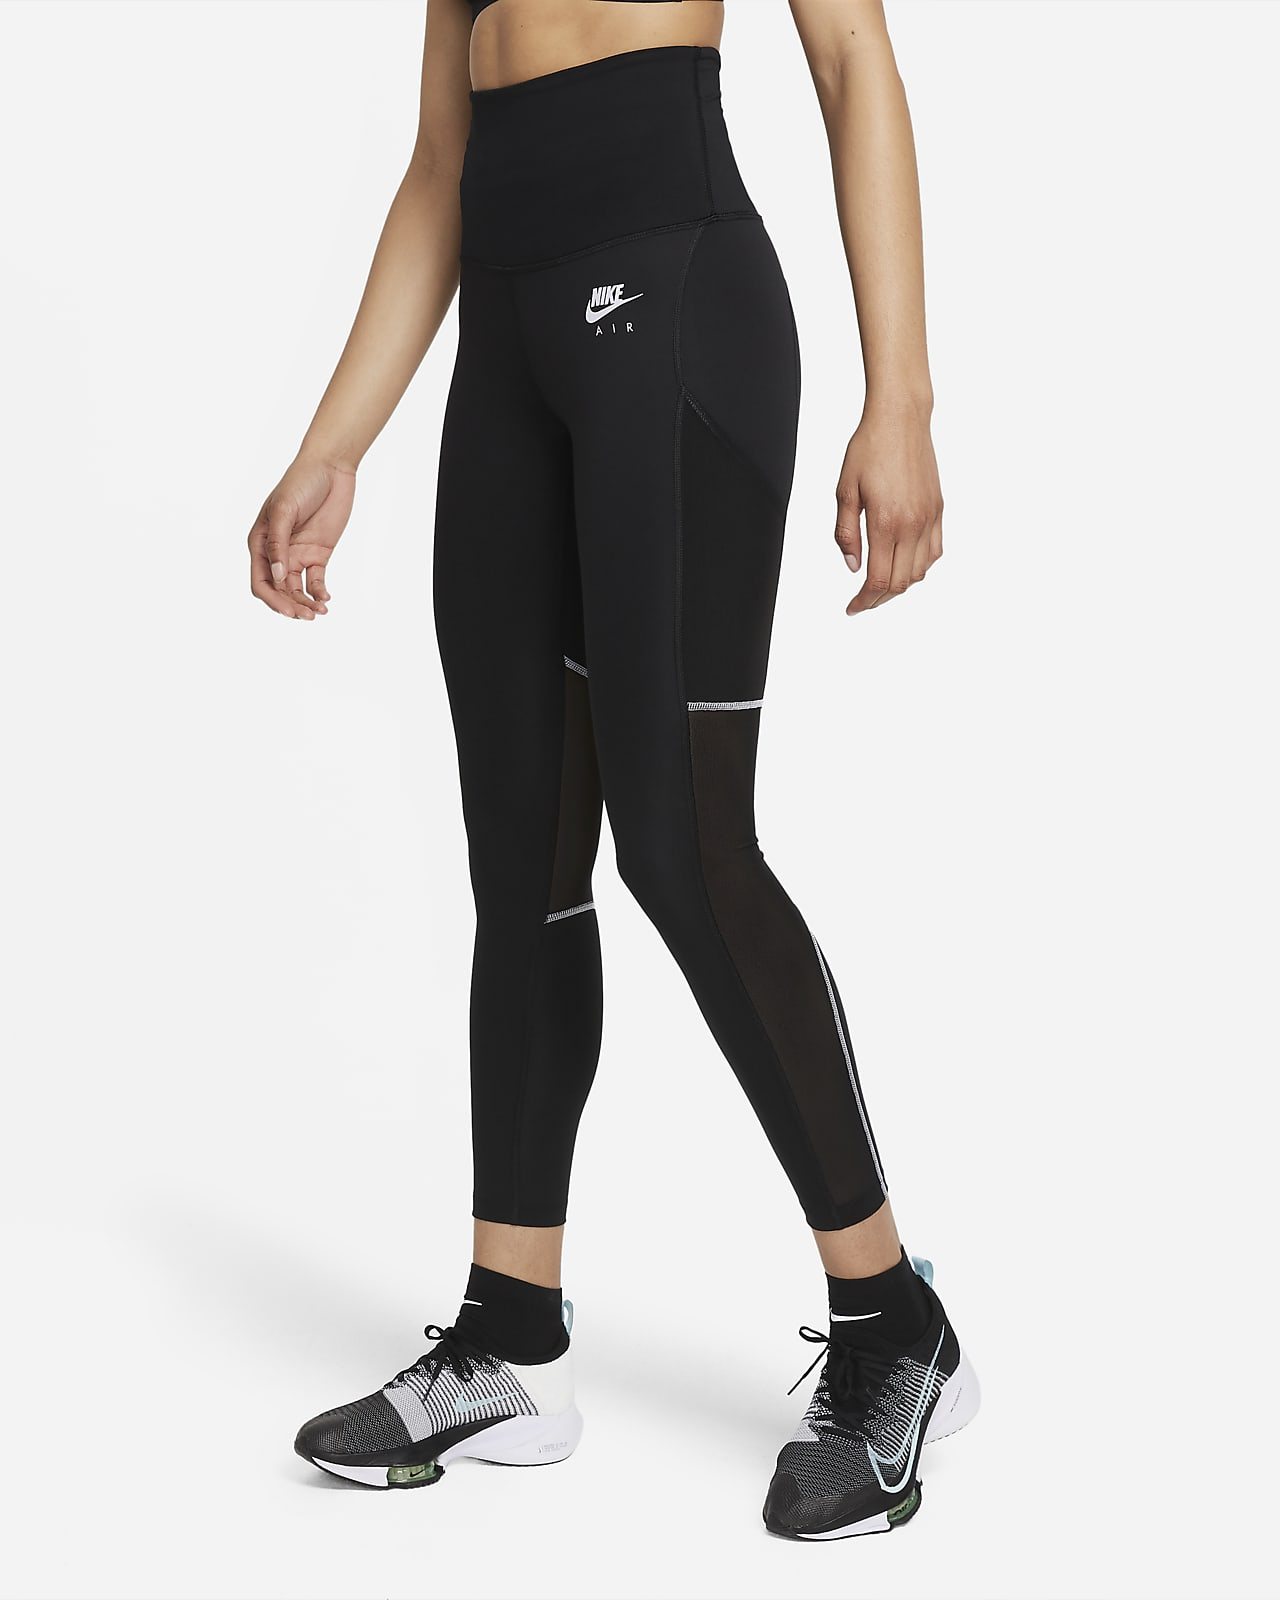 Nike Air Dri-FIT Women's Fold-Over Waist 7/8 Running Leggings